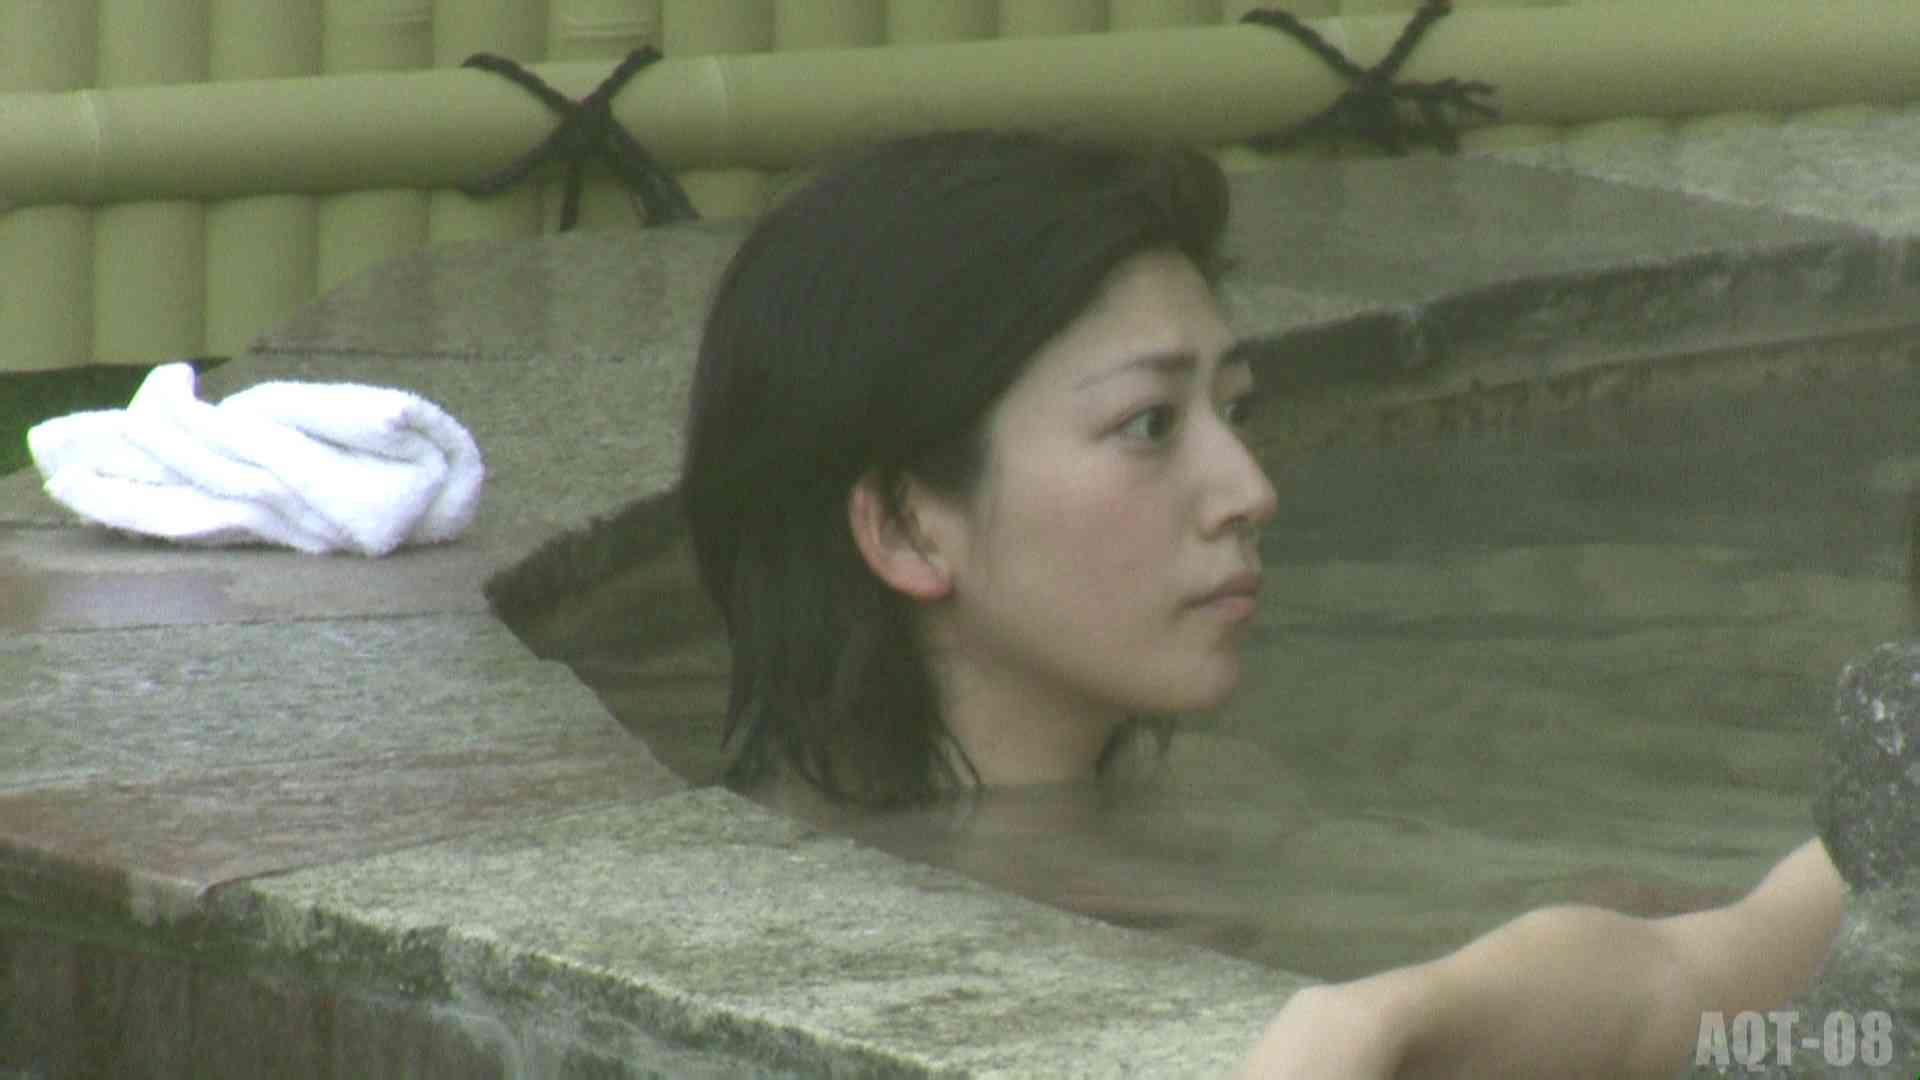 Aquaな露天風呂Vol.776 盗撮 | HなOL  60pic 2